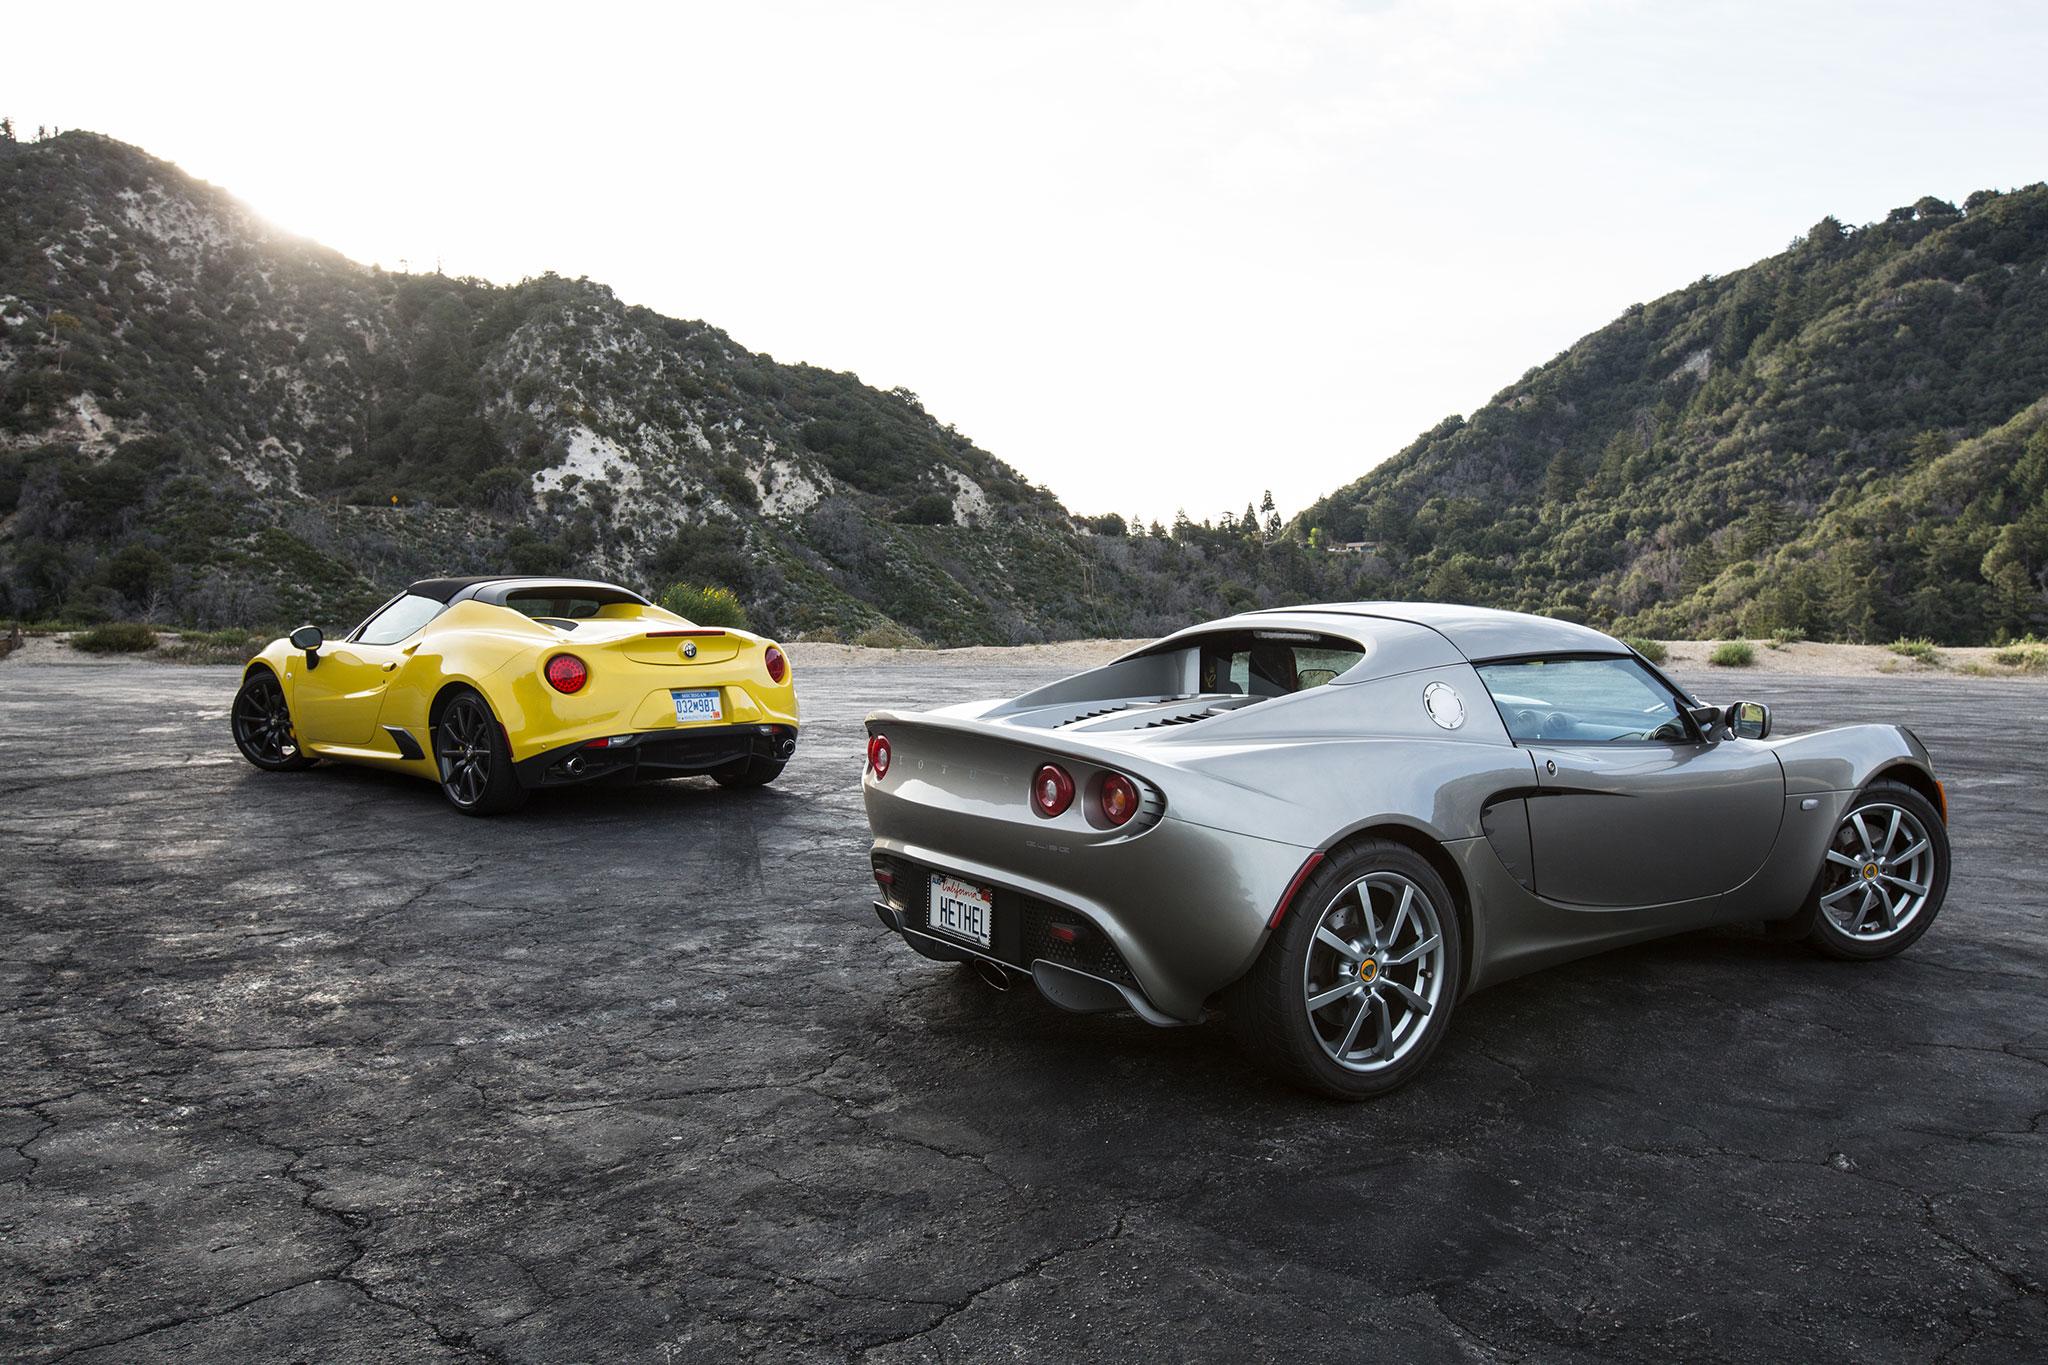 http://st.automobilemag.com/uploads/sites/11/2016/04/2015-Alfa-Romeo-4C-Spider-vs-2005-Lotus-Elise-11.jpg